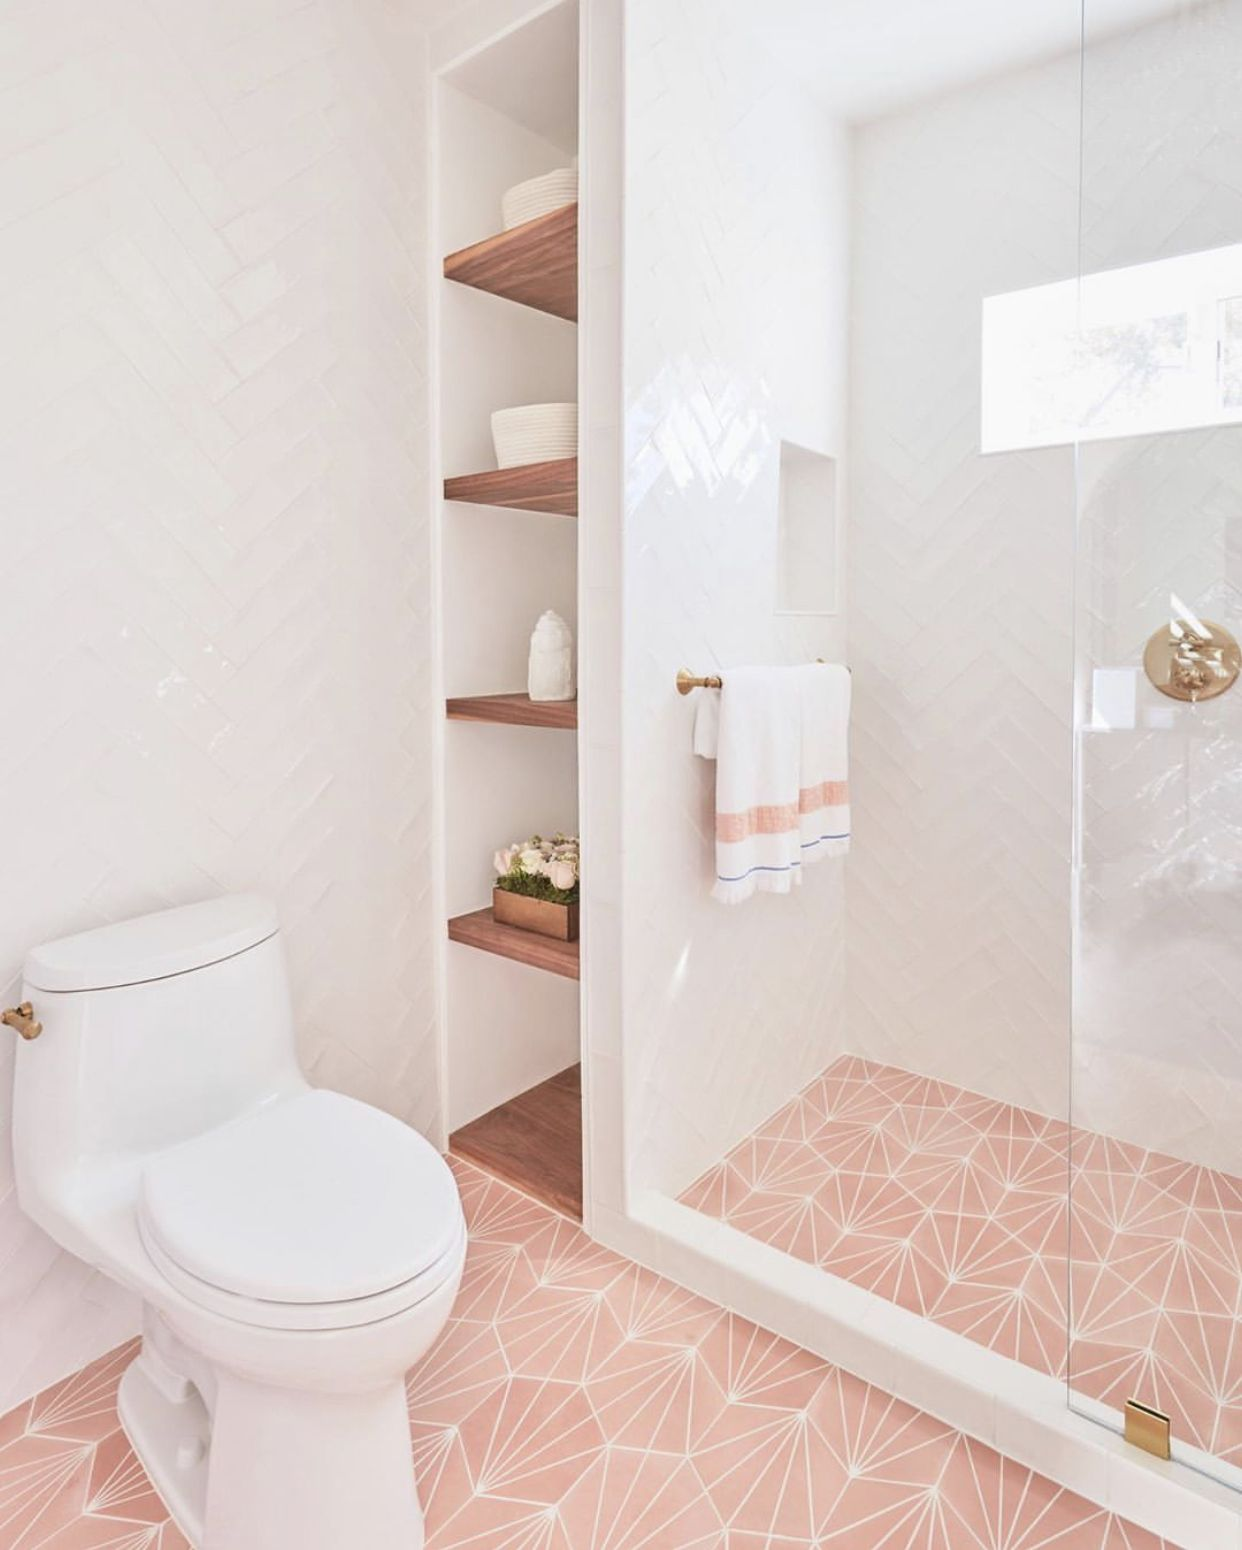 Riad Tile Cement Tile Nola Pink Bathroom Addition Bathroom Interior Design Bathroom Interior